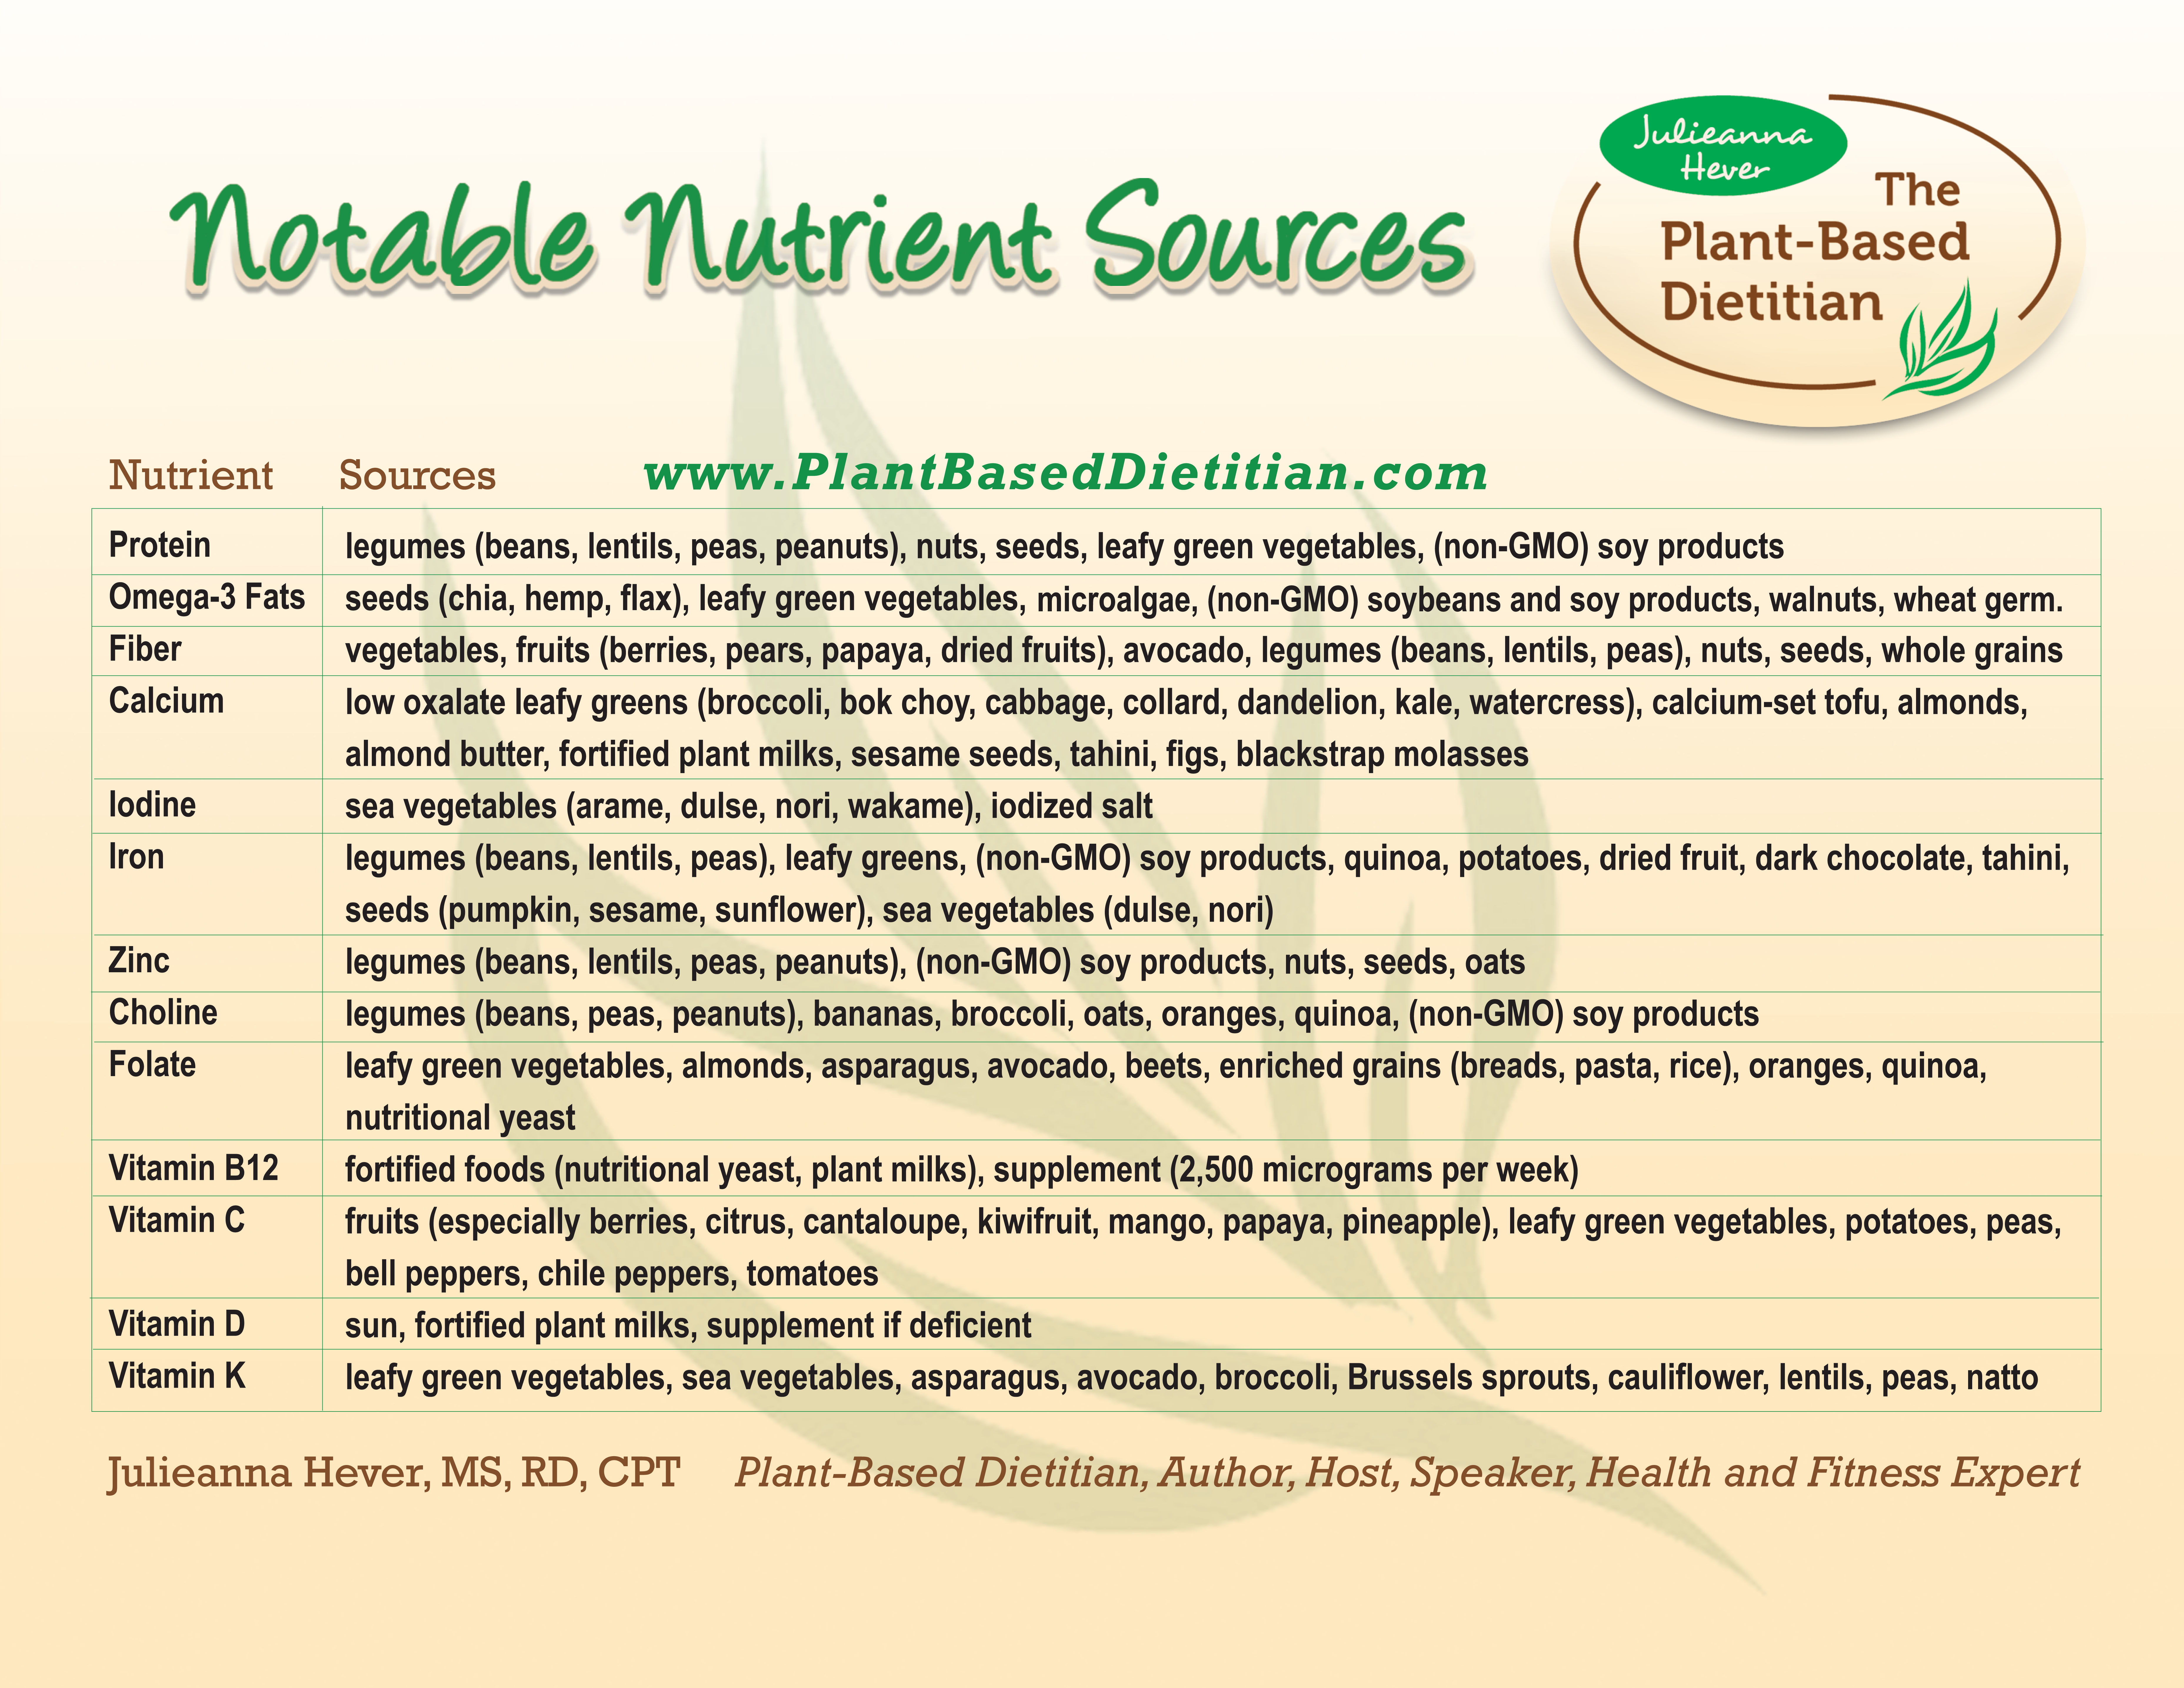 Notablenutrients_Edited_FB